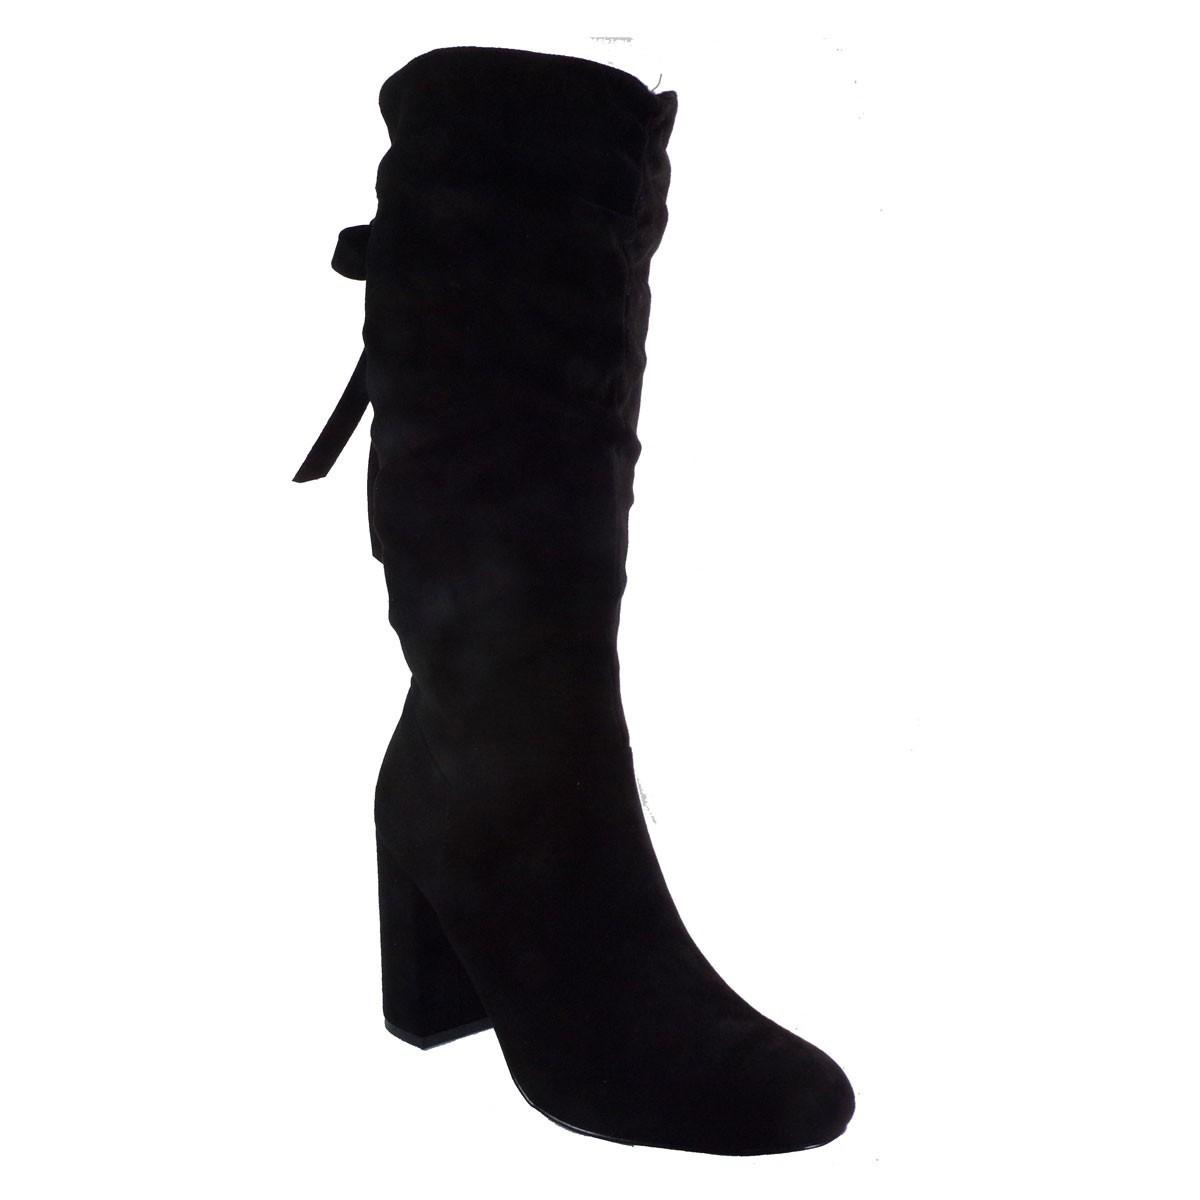 Exe Shoes Γυναικεία Παπούτσια Μπότα CARINA-620 Μαύρo Καστόρι H2700620500405